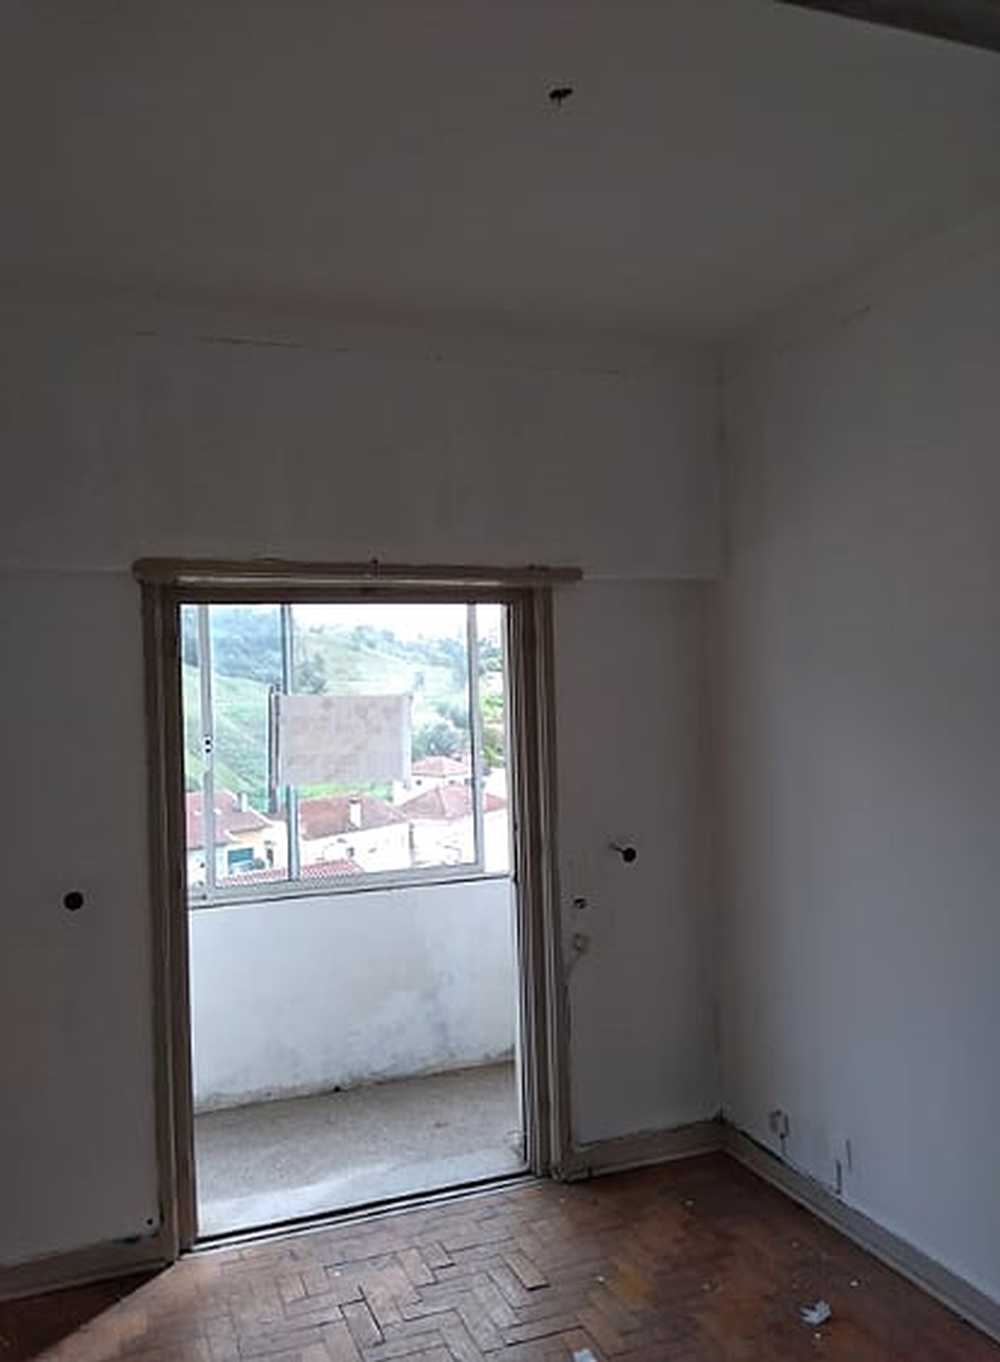 Paúl Coimbra 公寓 照片 #request.properties.id#